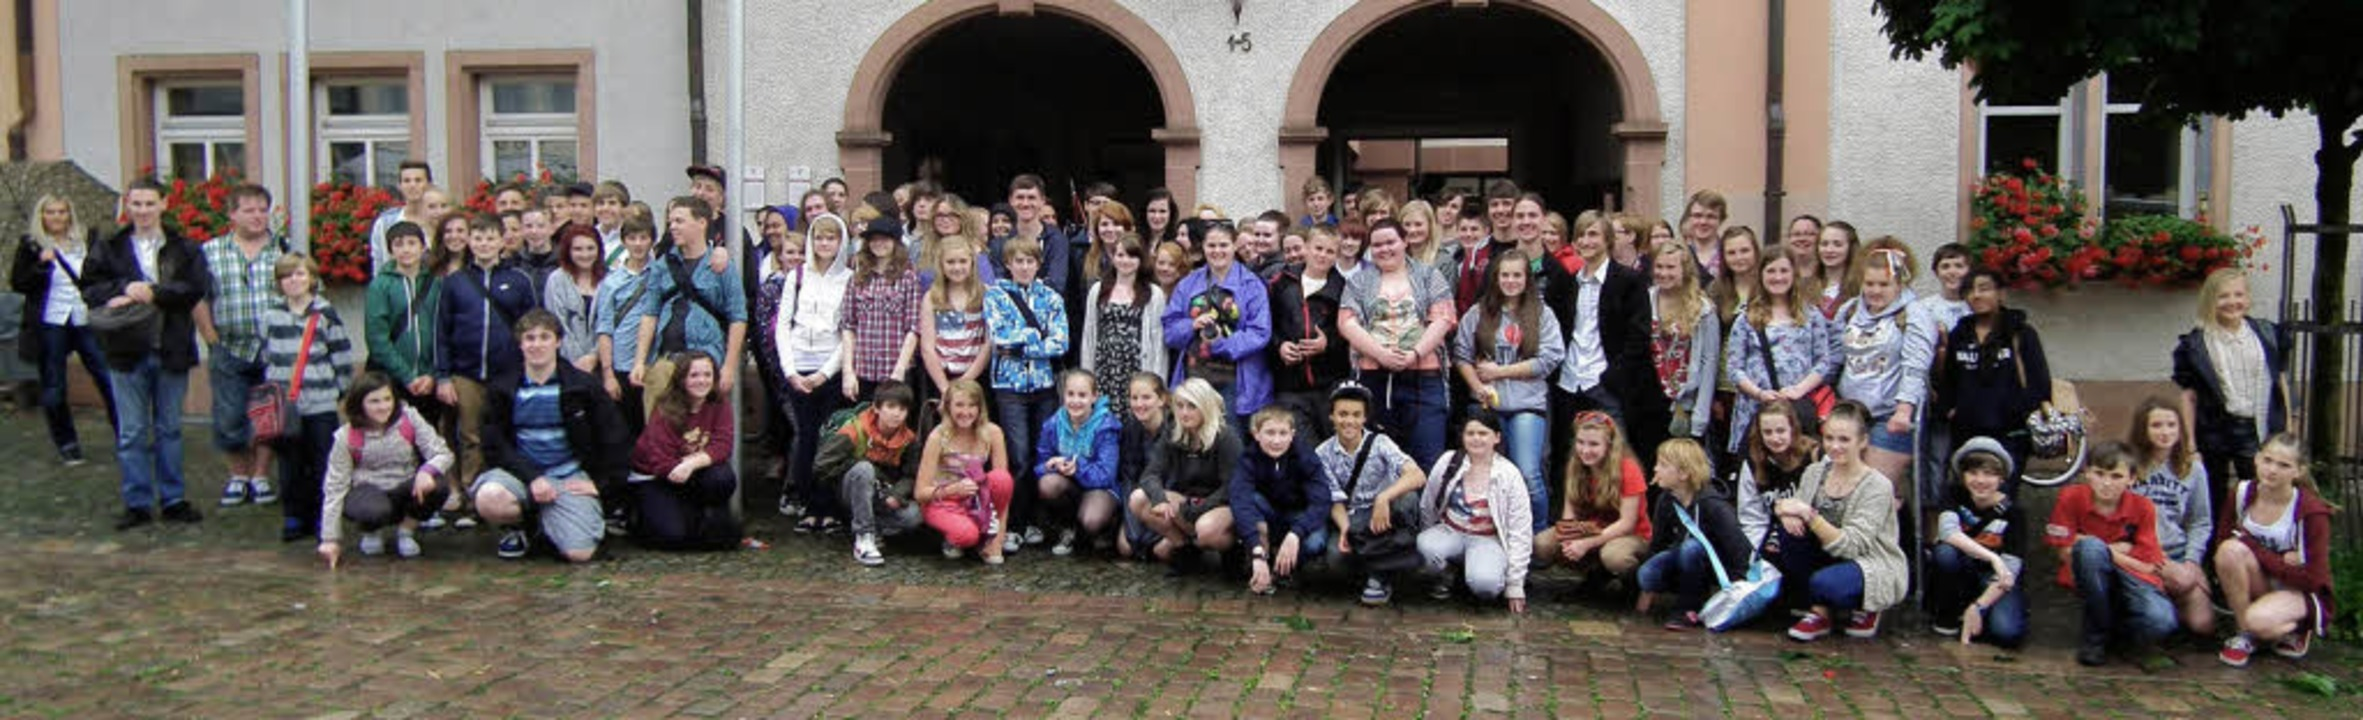 77 Schüler der Sir Robert Woodart Acad... ihr musikalisches Können unter Beweis  | Foto: Rebekka Sommer